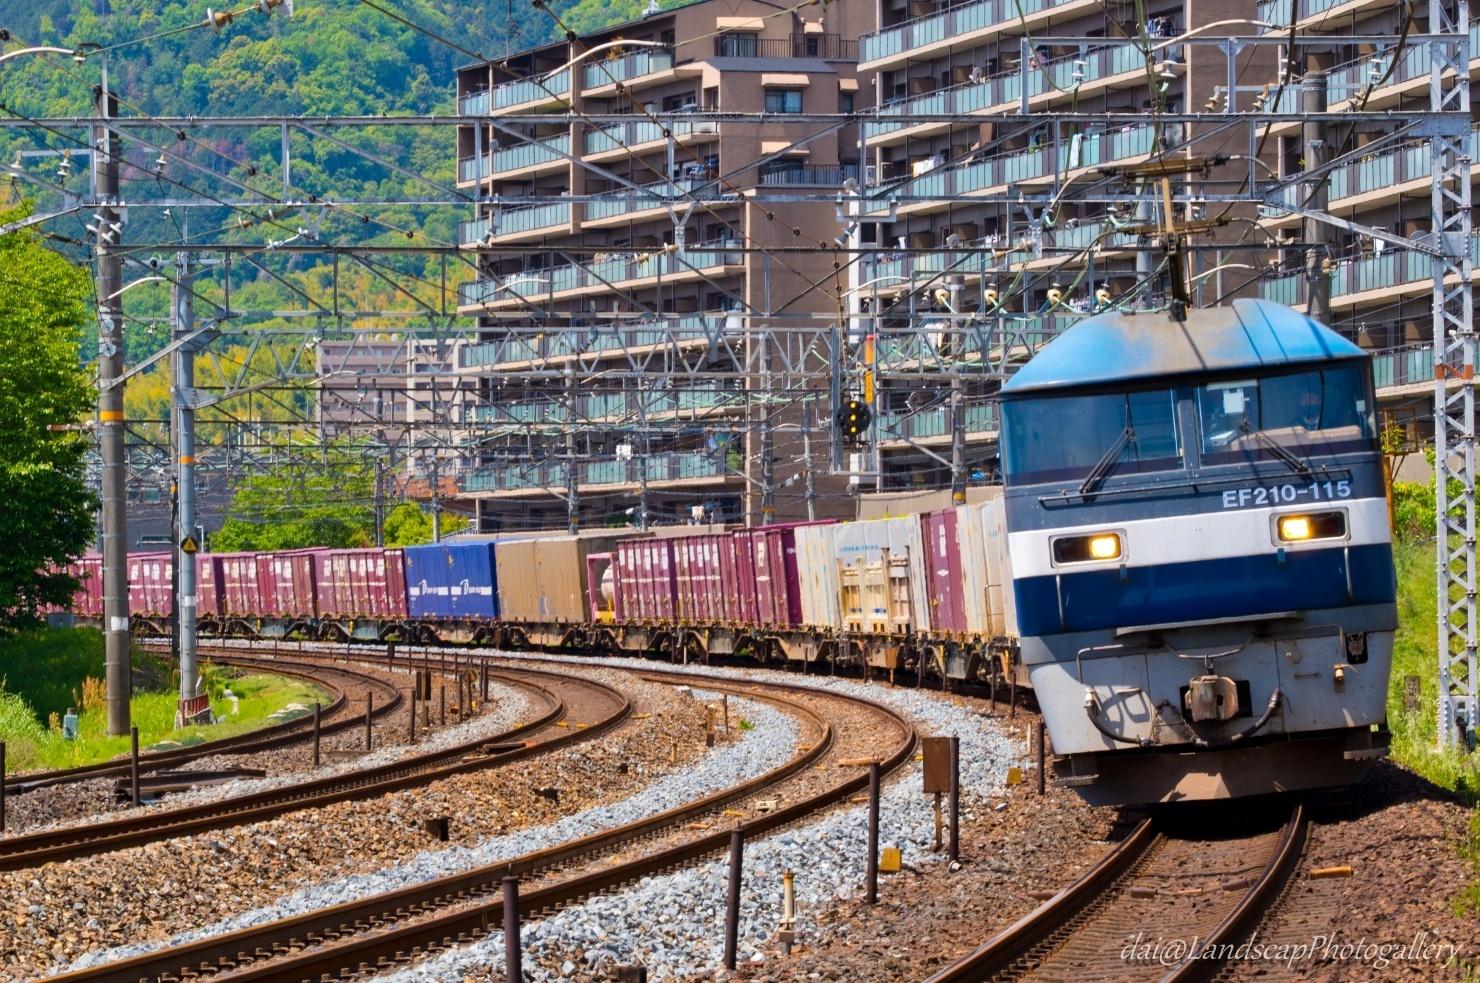 EF210-115 コンテナ列車